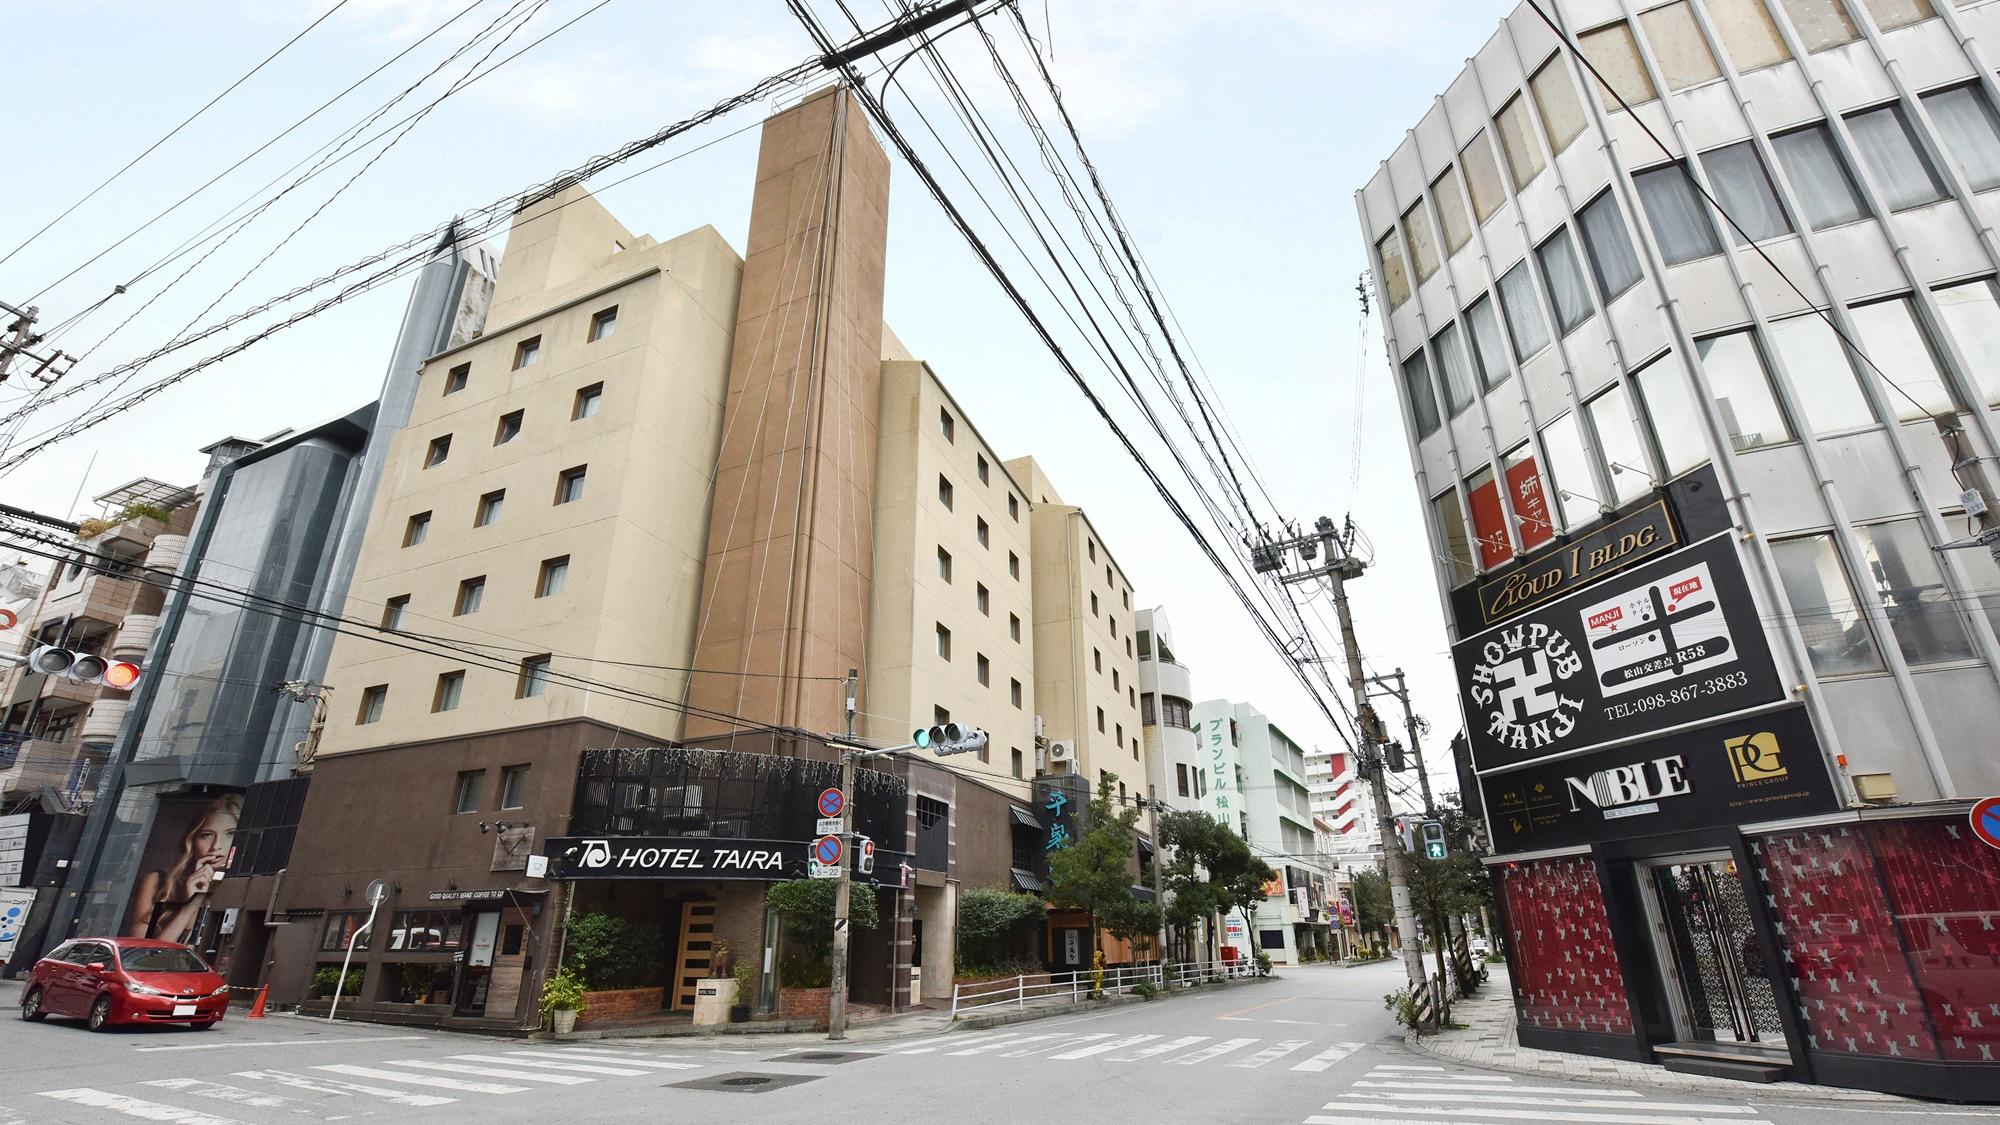 f5a88ba3ce ホテル タイラ沖縄最大の松山飲食街の中心に在り、周囲には大手企業の支社が立ち並び、ビジネス活動に最適です。国際通りまで徒歩10数分です